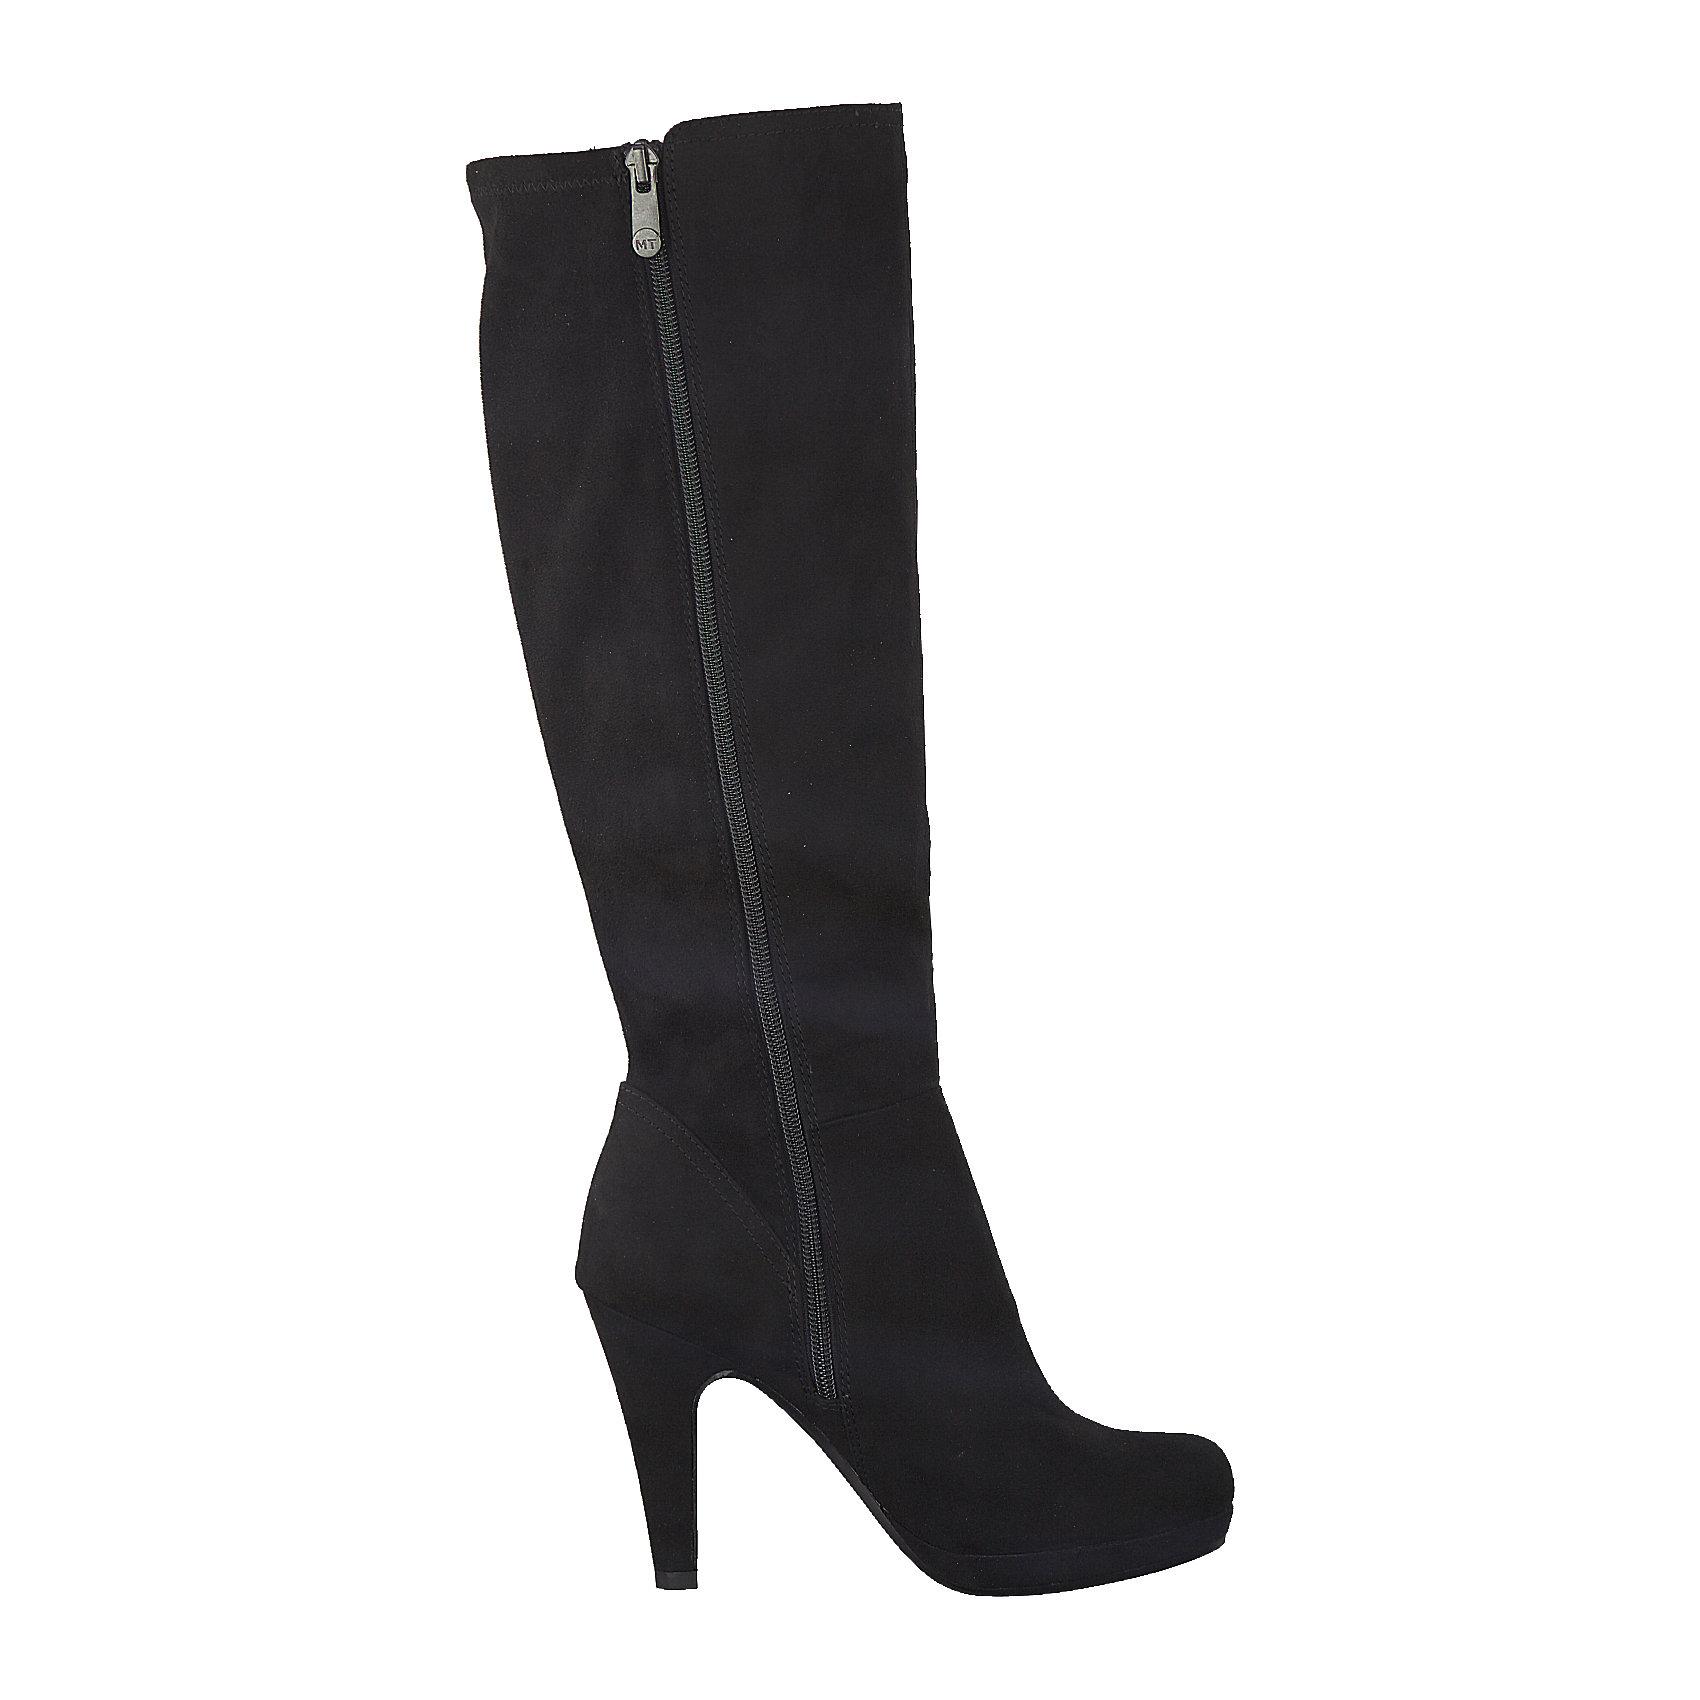 Neu MARCO TOZZI Stiefel 6872739 für Damen schwarz schwarz Modell 1